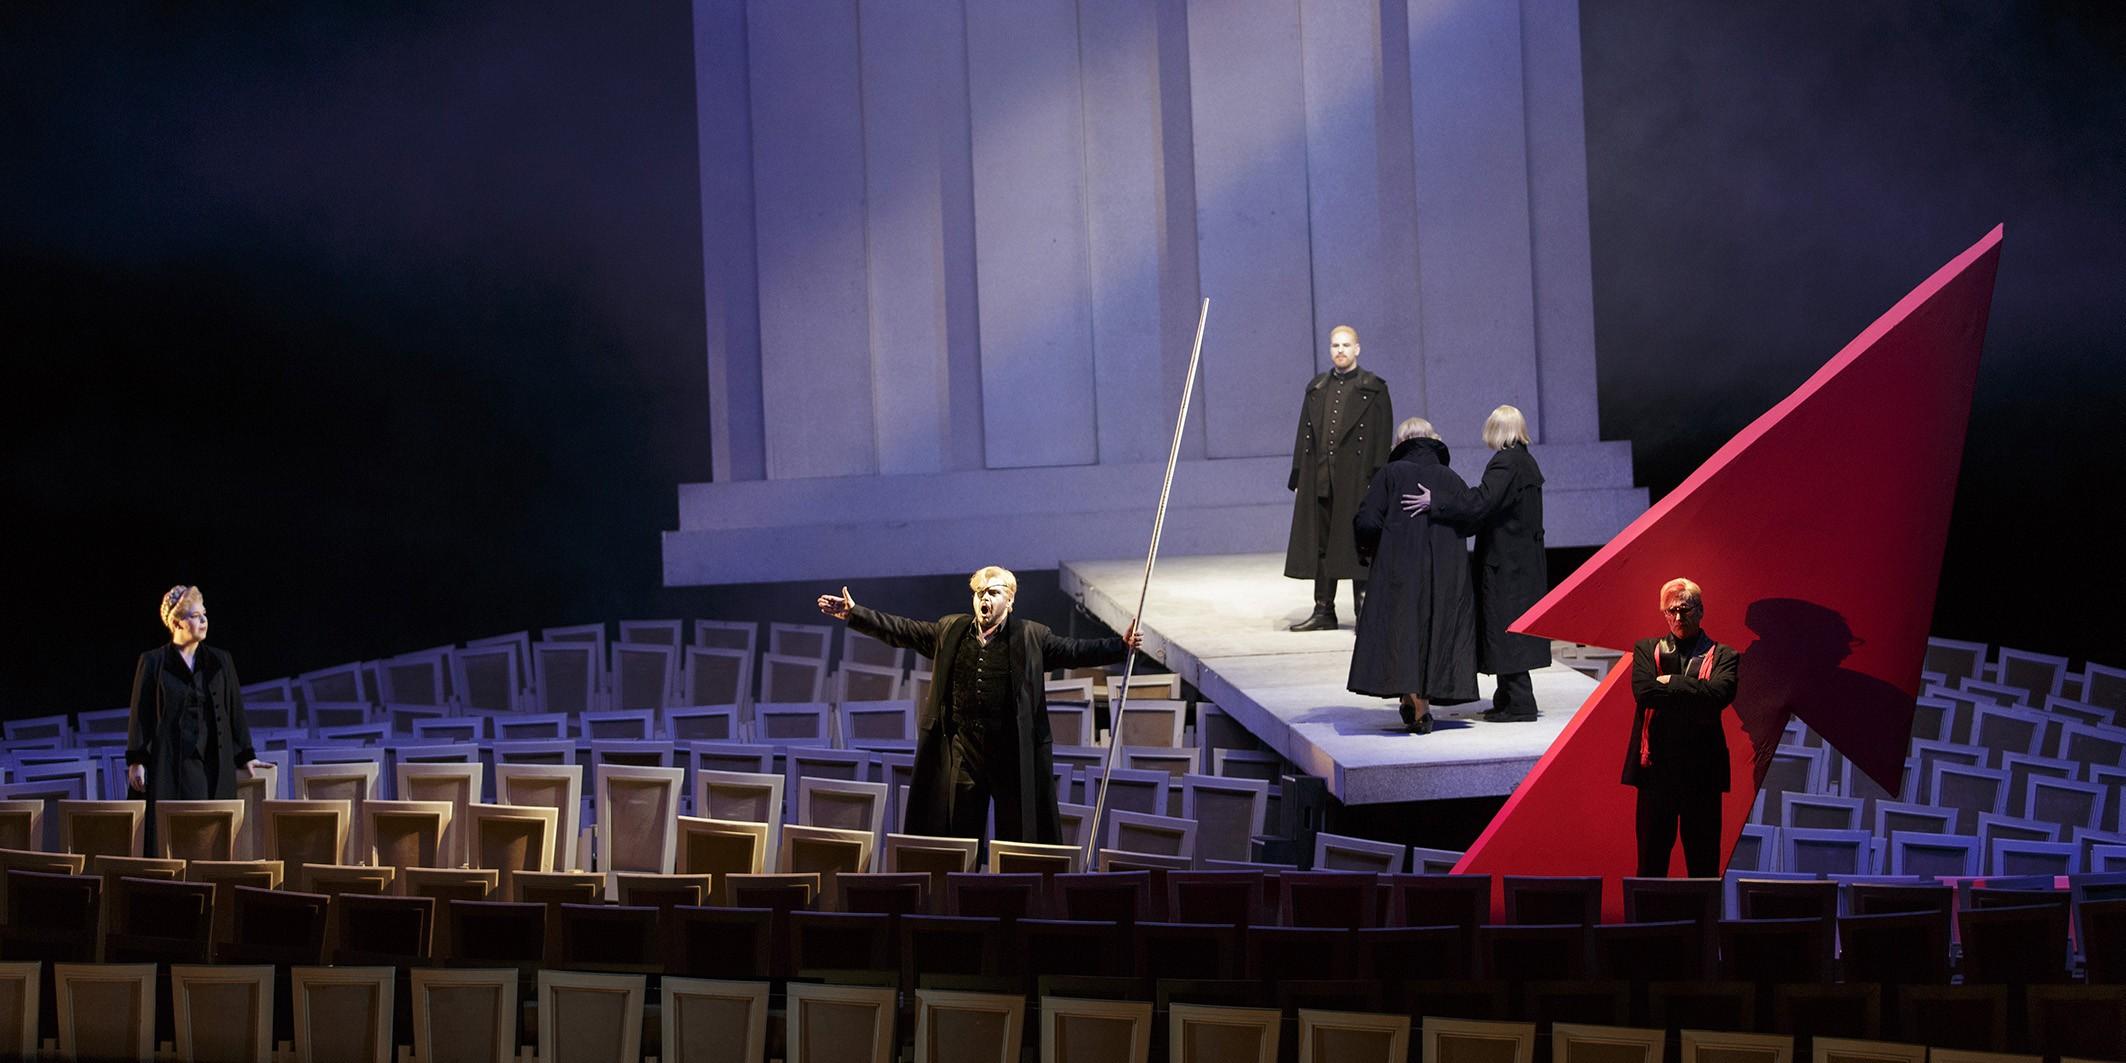 Thielemann comienza con un brillante Rheingold